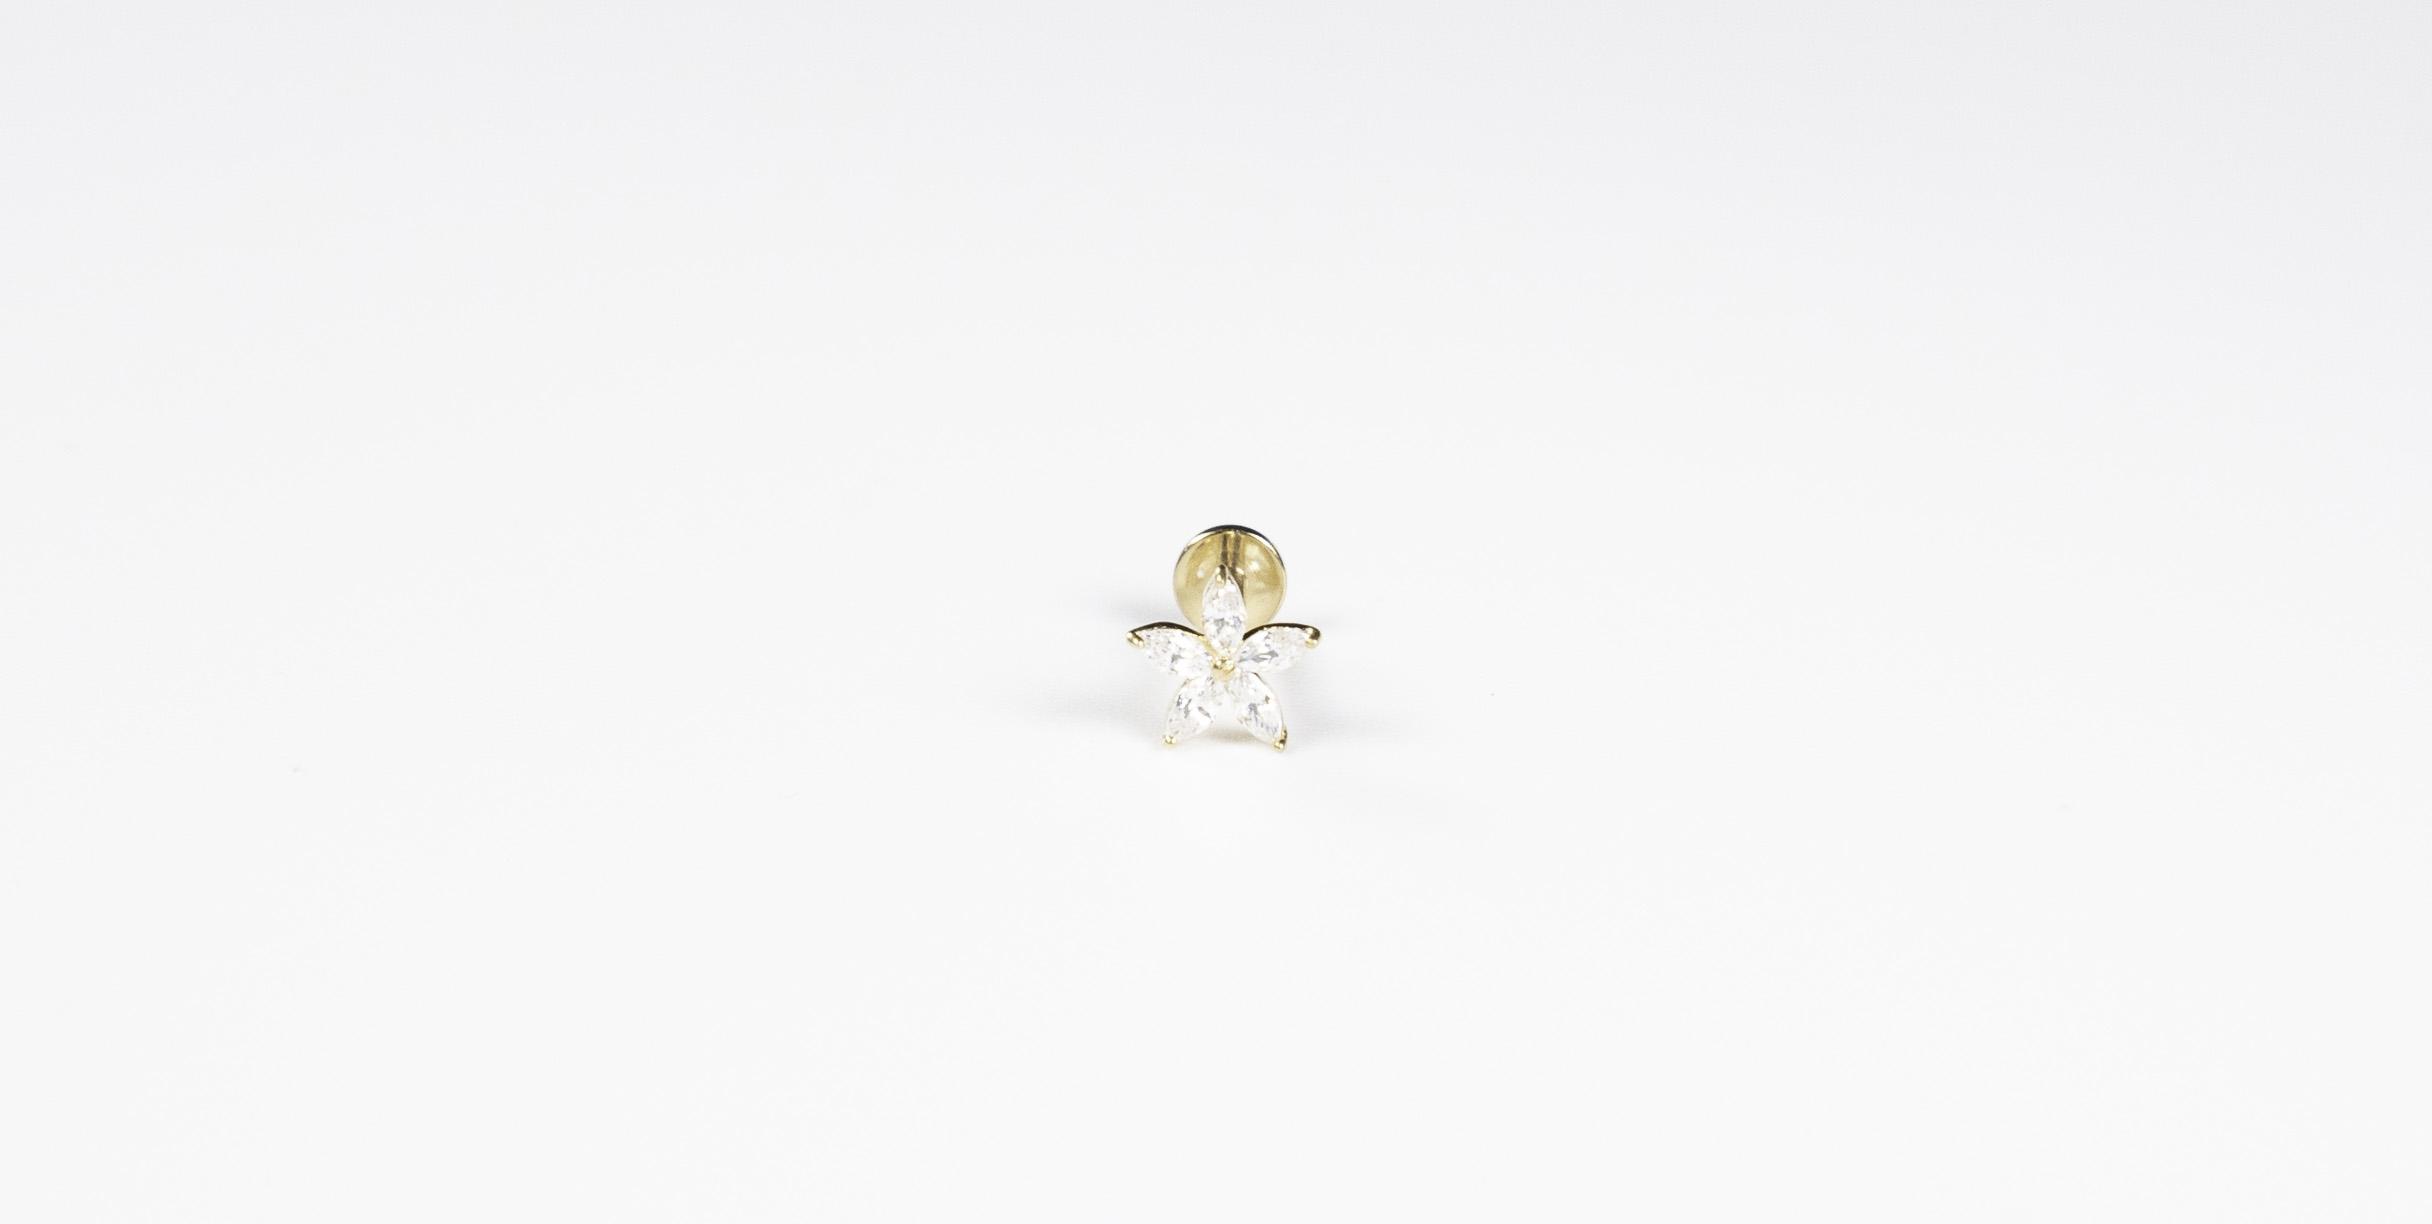 14k Solid Gold 5-Petal Gem - Bella Andrea London Piercing Jewellery (1)